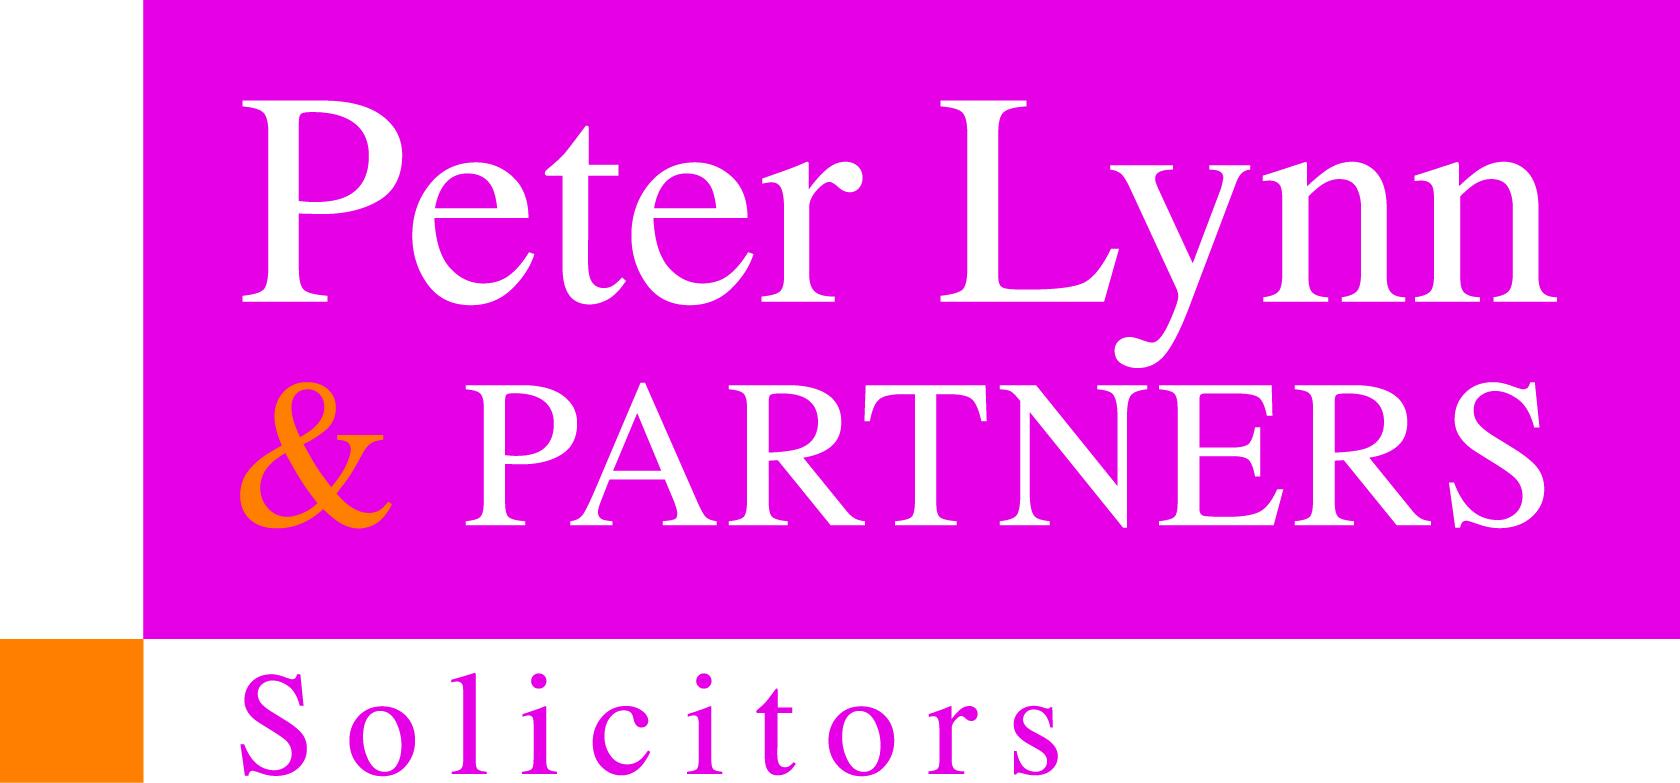 Peter Lynn & PARTNERS